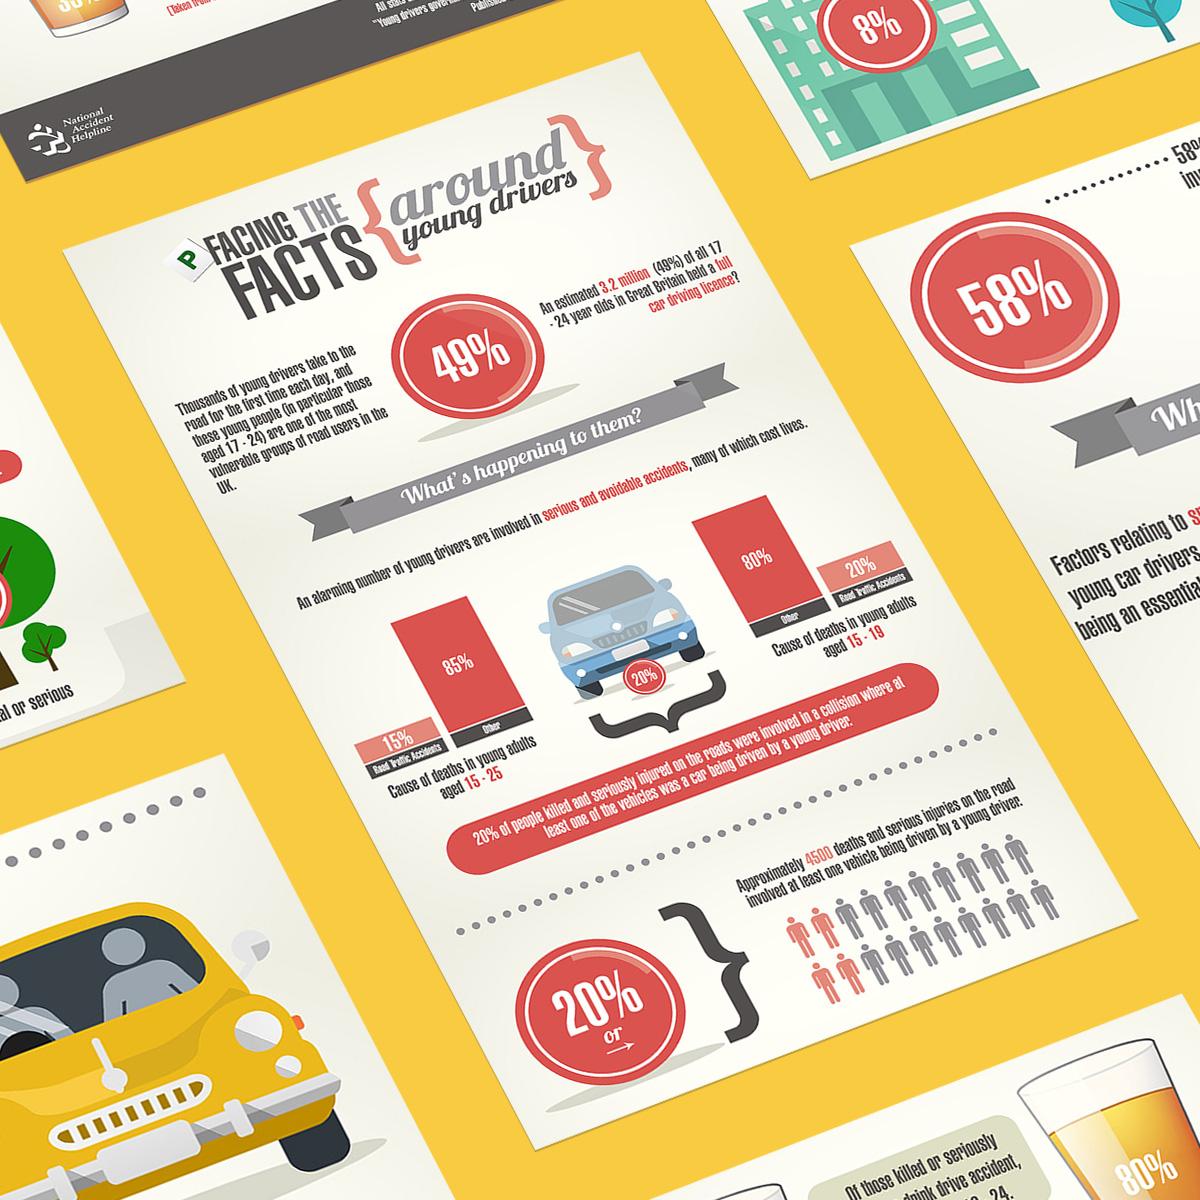 Infographic: Accident Helpline